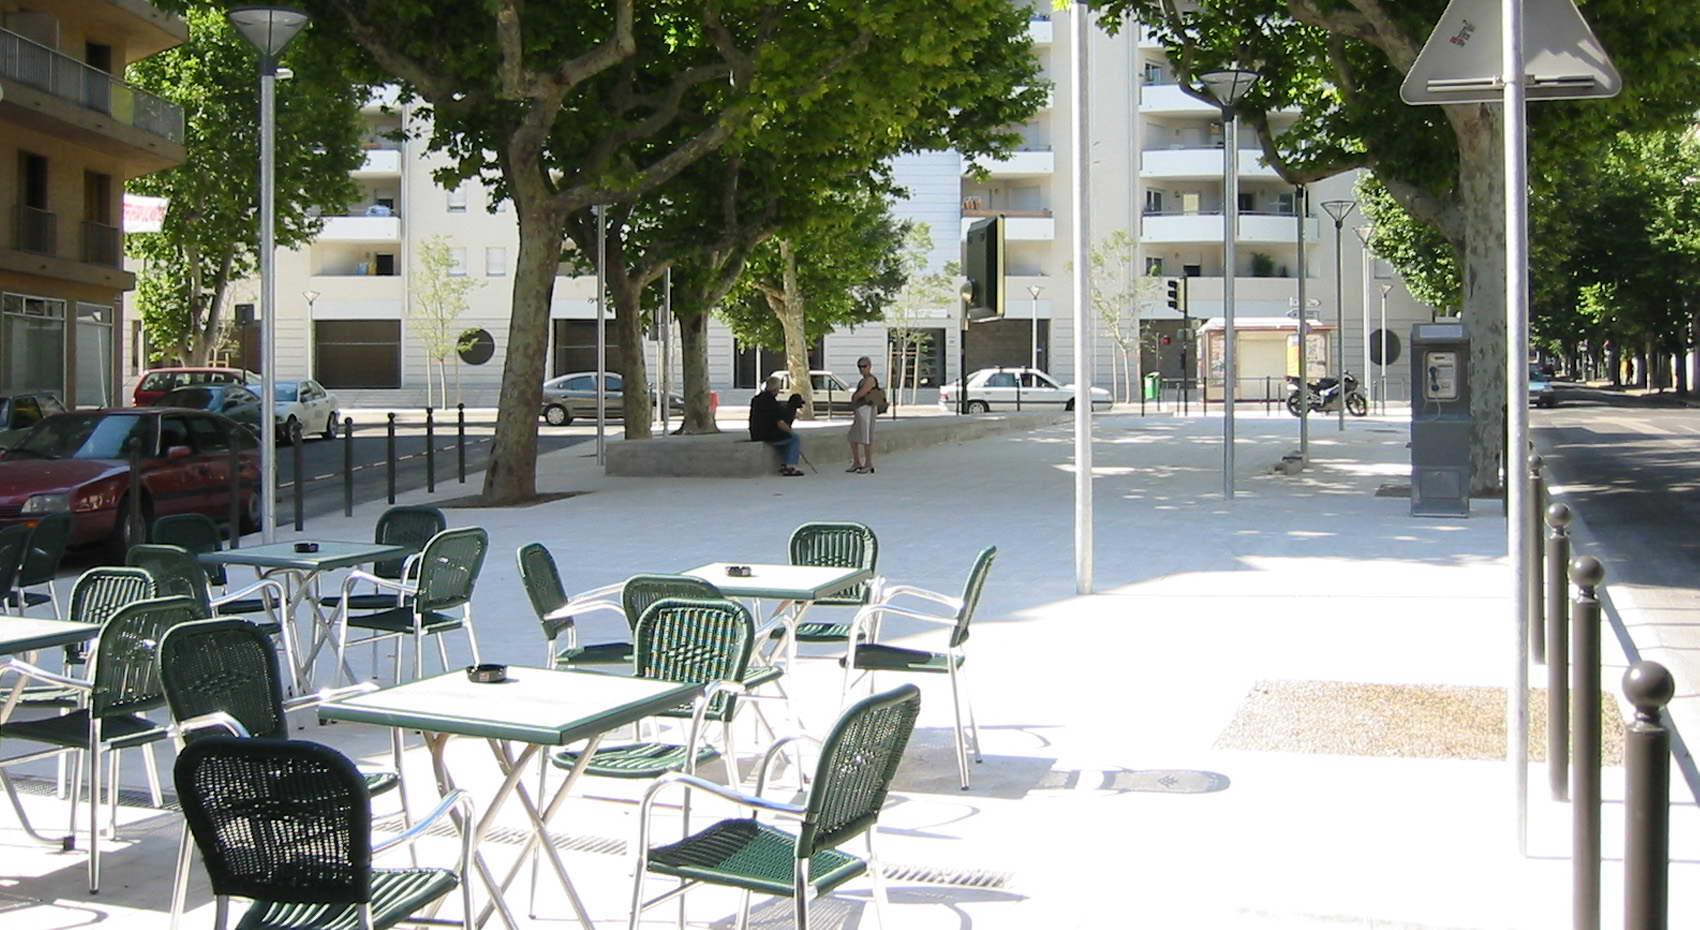 Place Mermoz